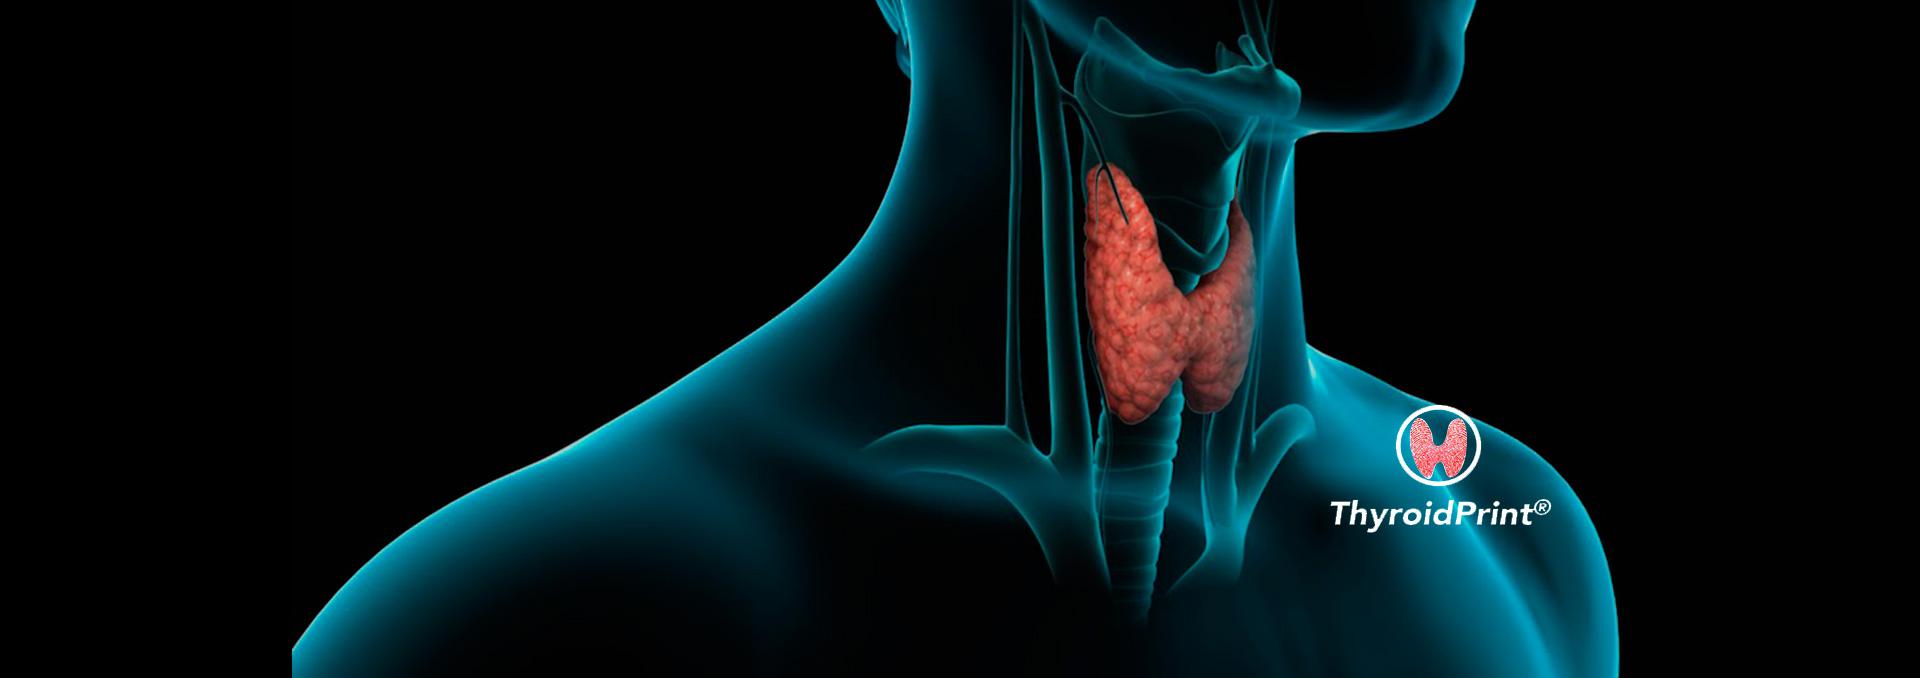 ThyroidPrint: el test que identifica con alta Exactitud si un nódulo tiroideo es benigno o no